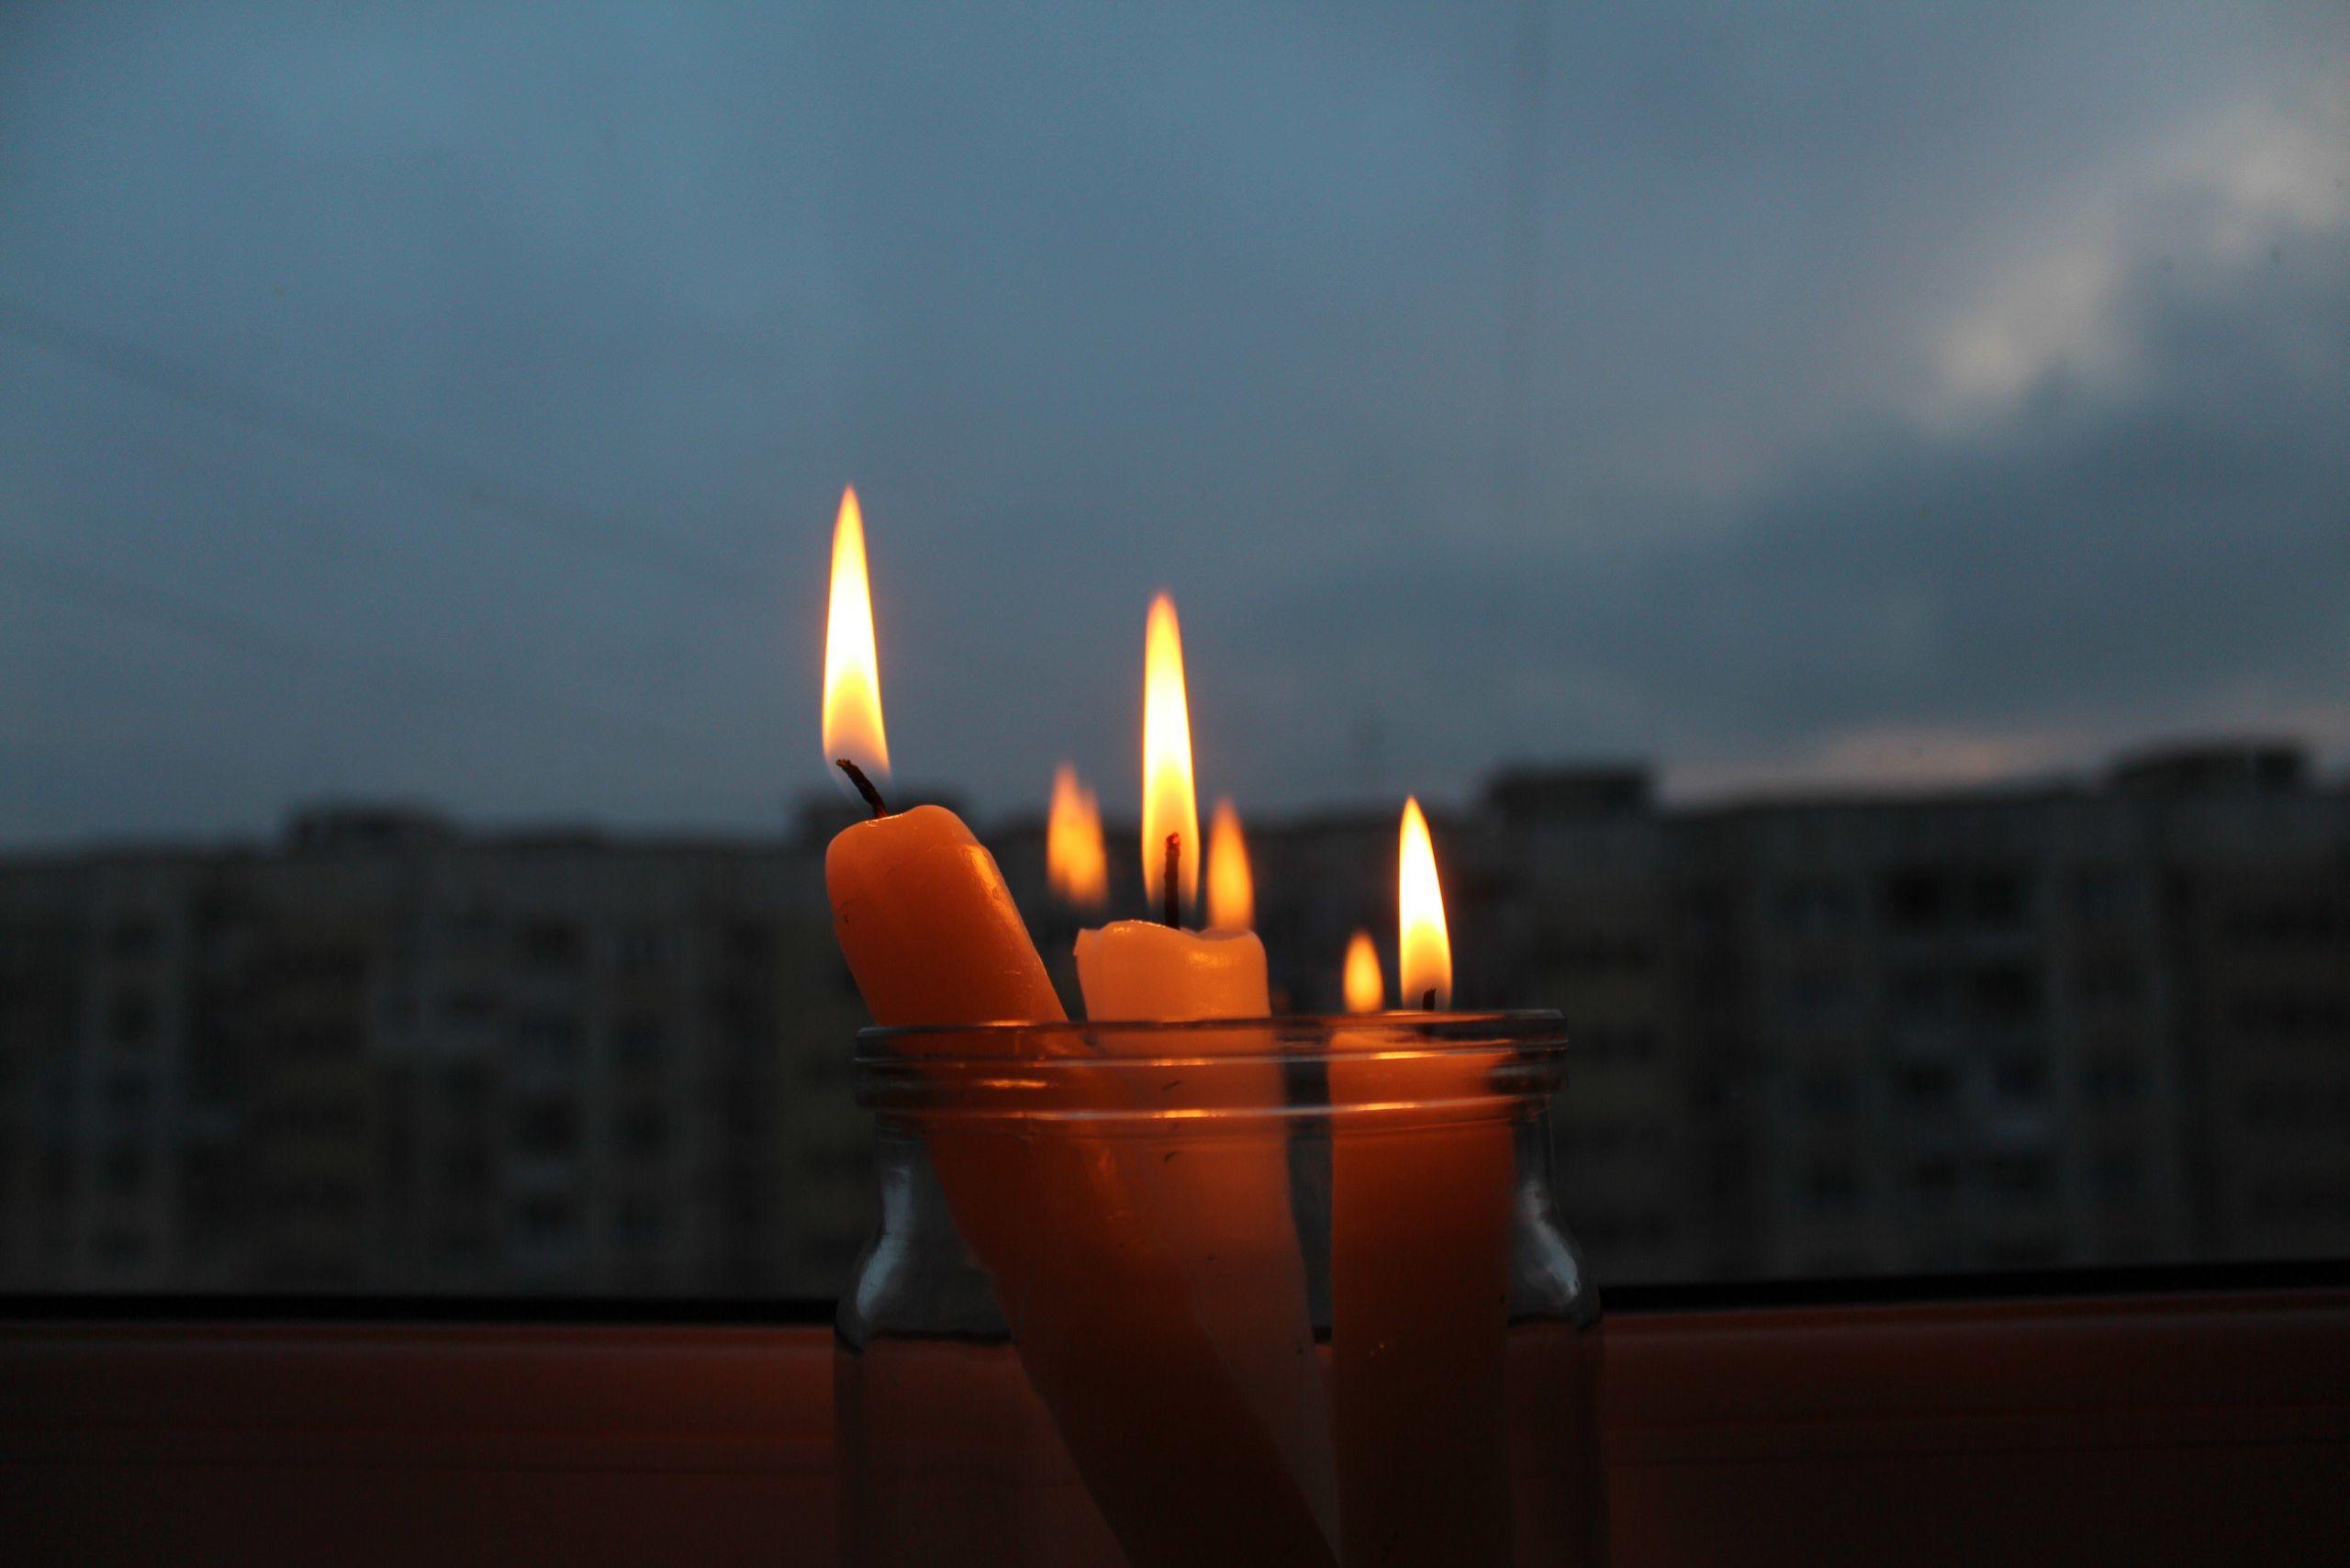 Де у Луцьку не буде світла у четвер, 23 травня